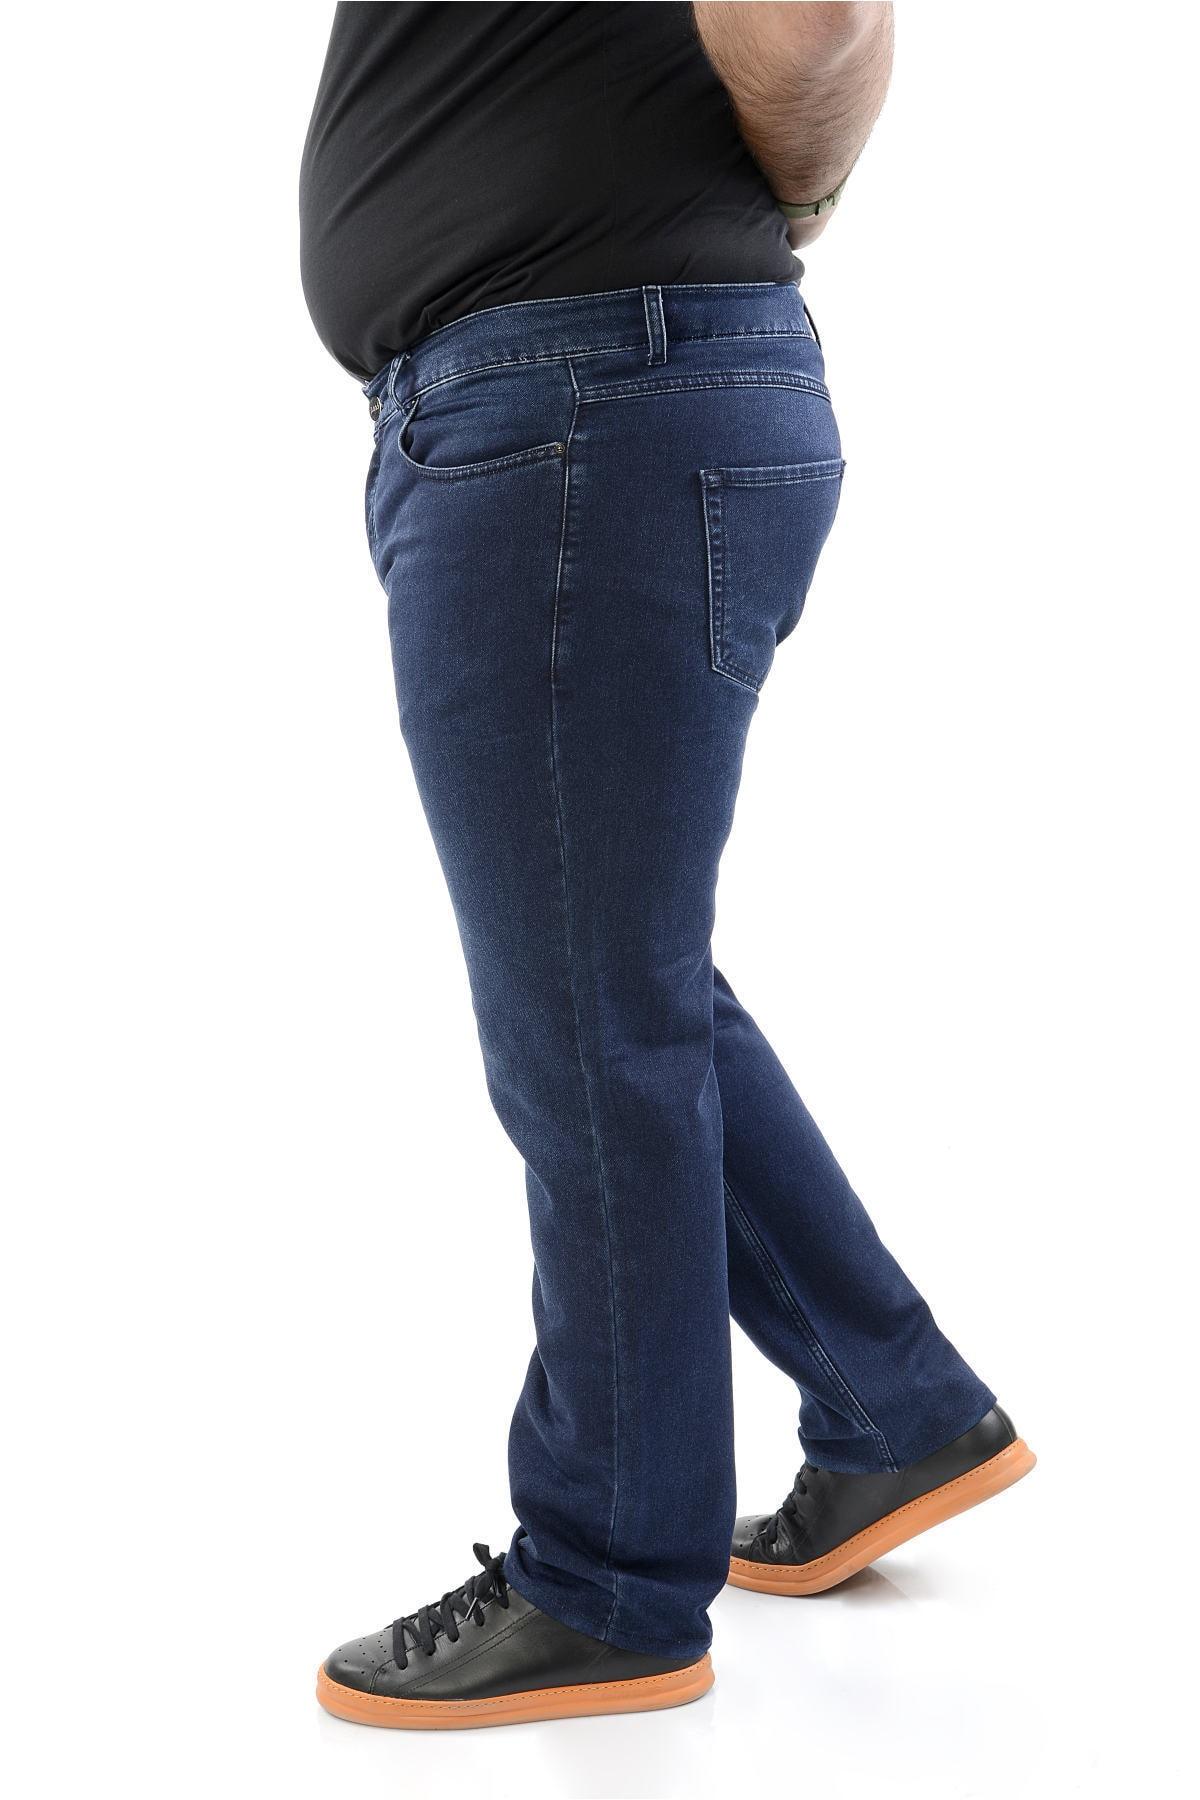 CEDY DENIM Mavi Erkek Kot Pantolon Battal Beden Slim Fit Jean - C4000 2